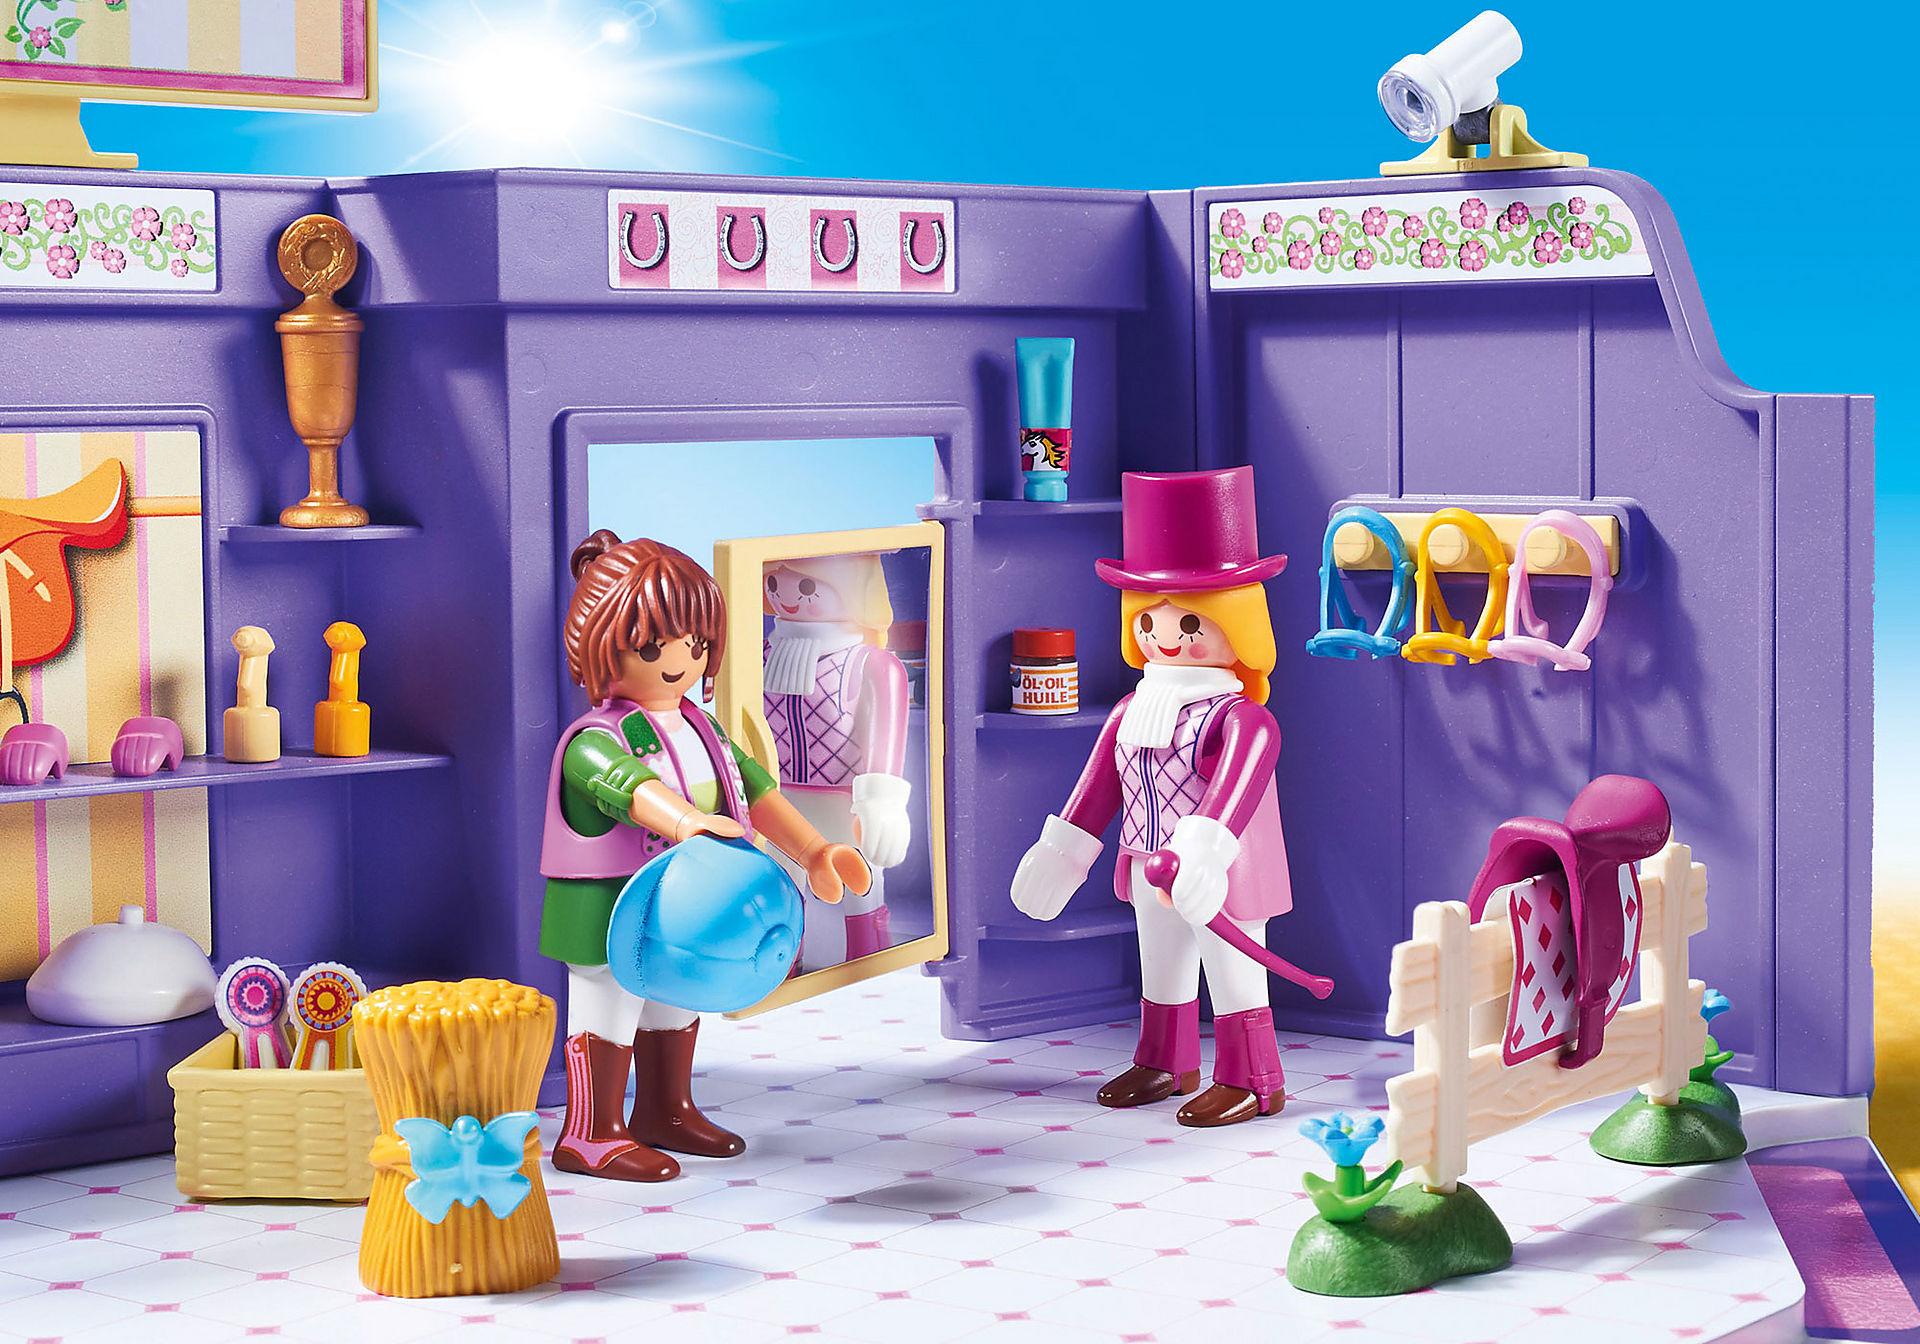 http://media.playmobil.com/i/playmobil/9401_product_extra2/Rideudstyrsbutik